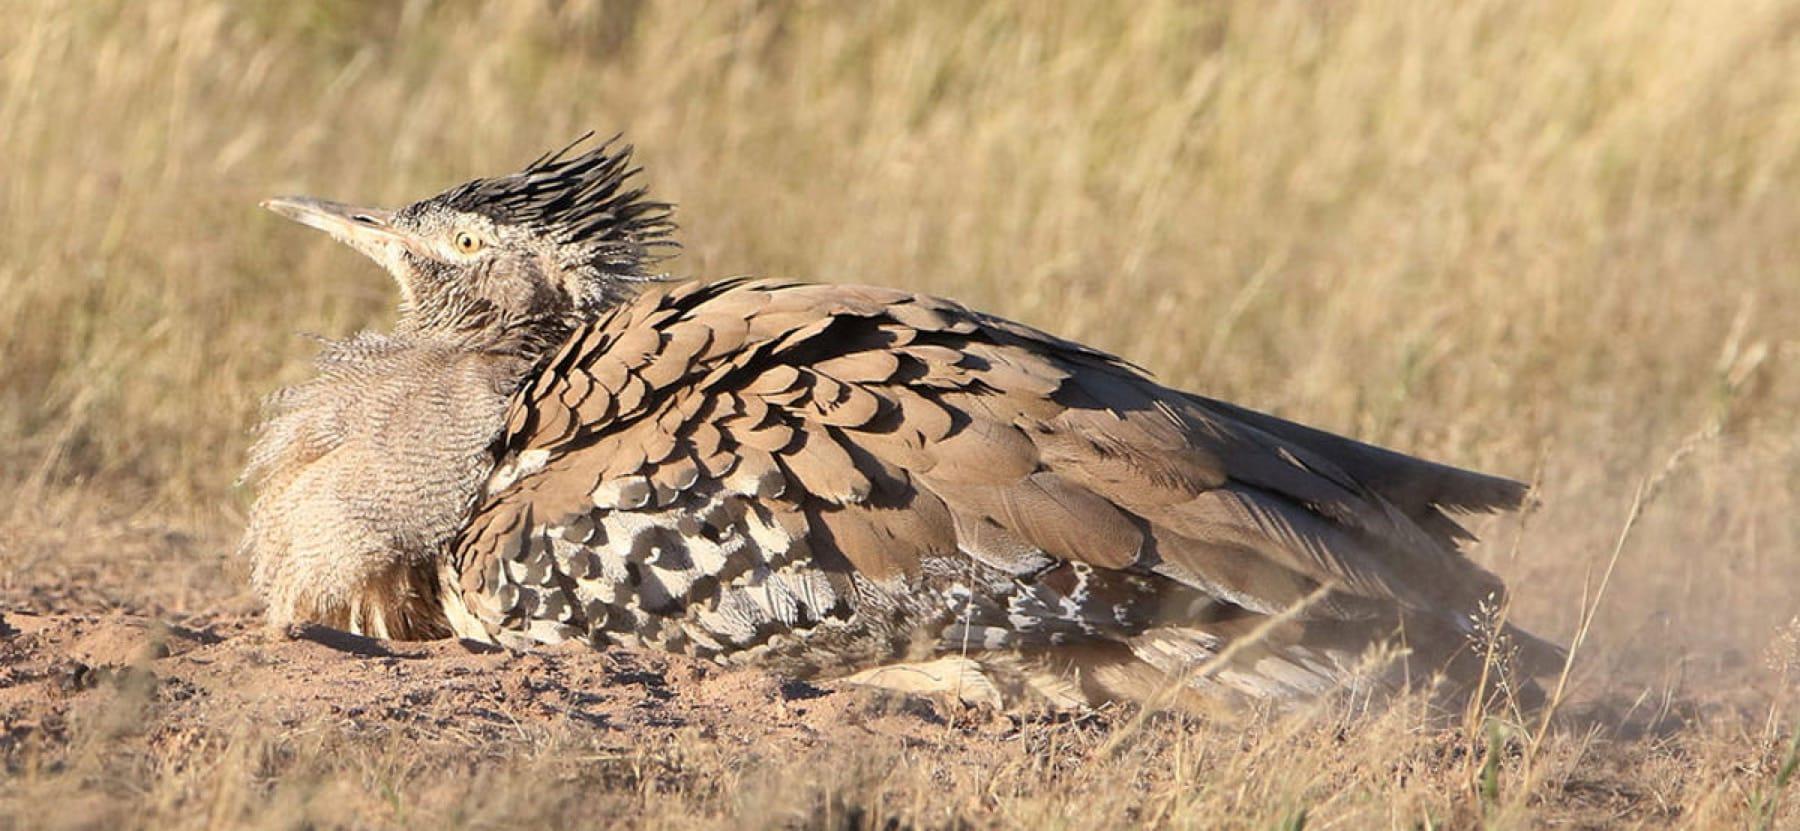 Birding safari holidays in South Africa_Kori Bustard